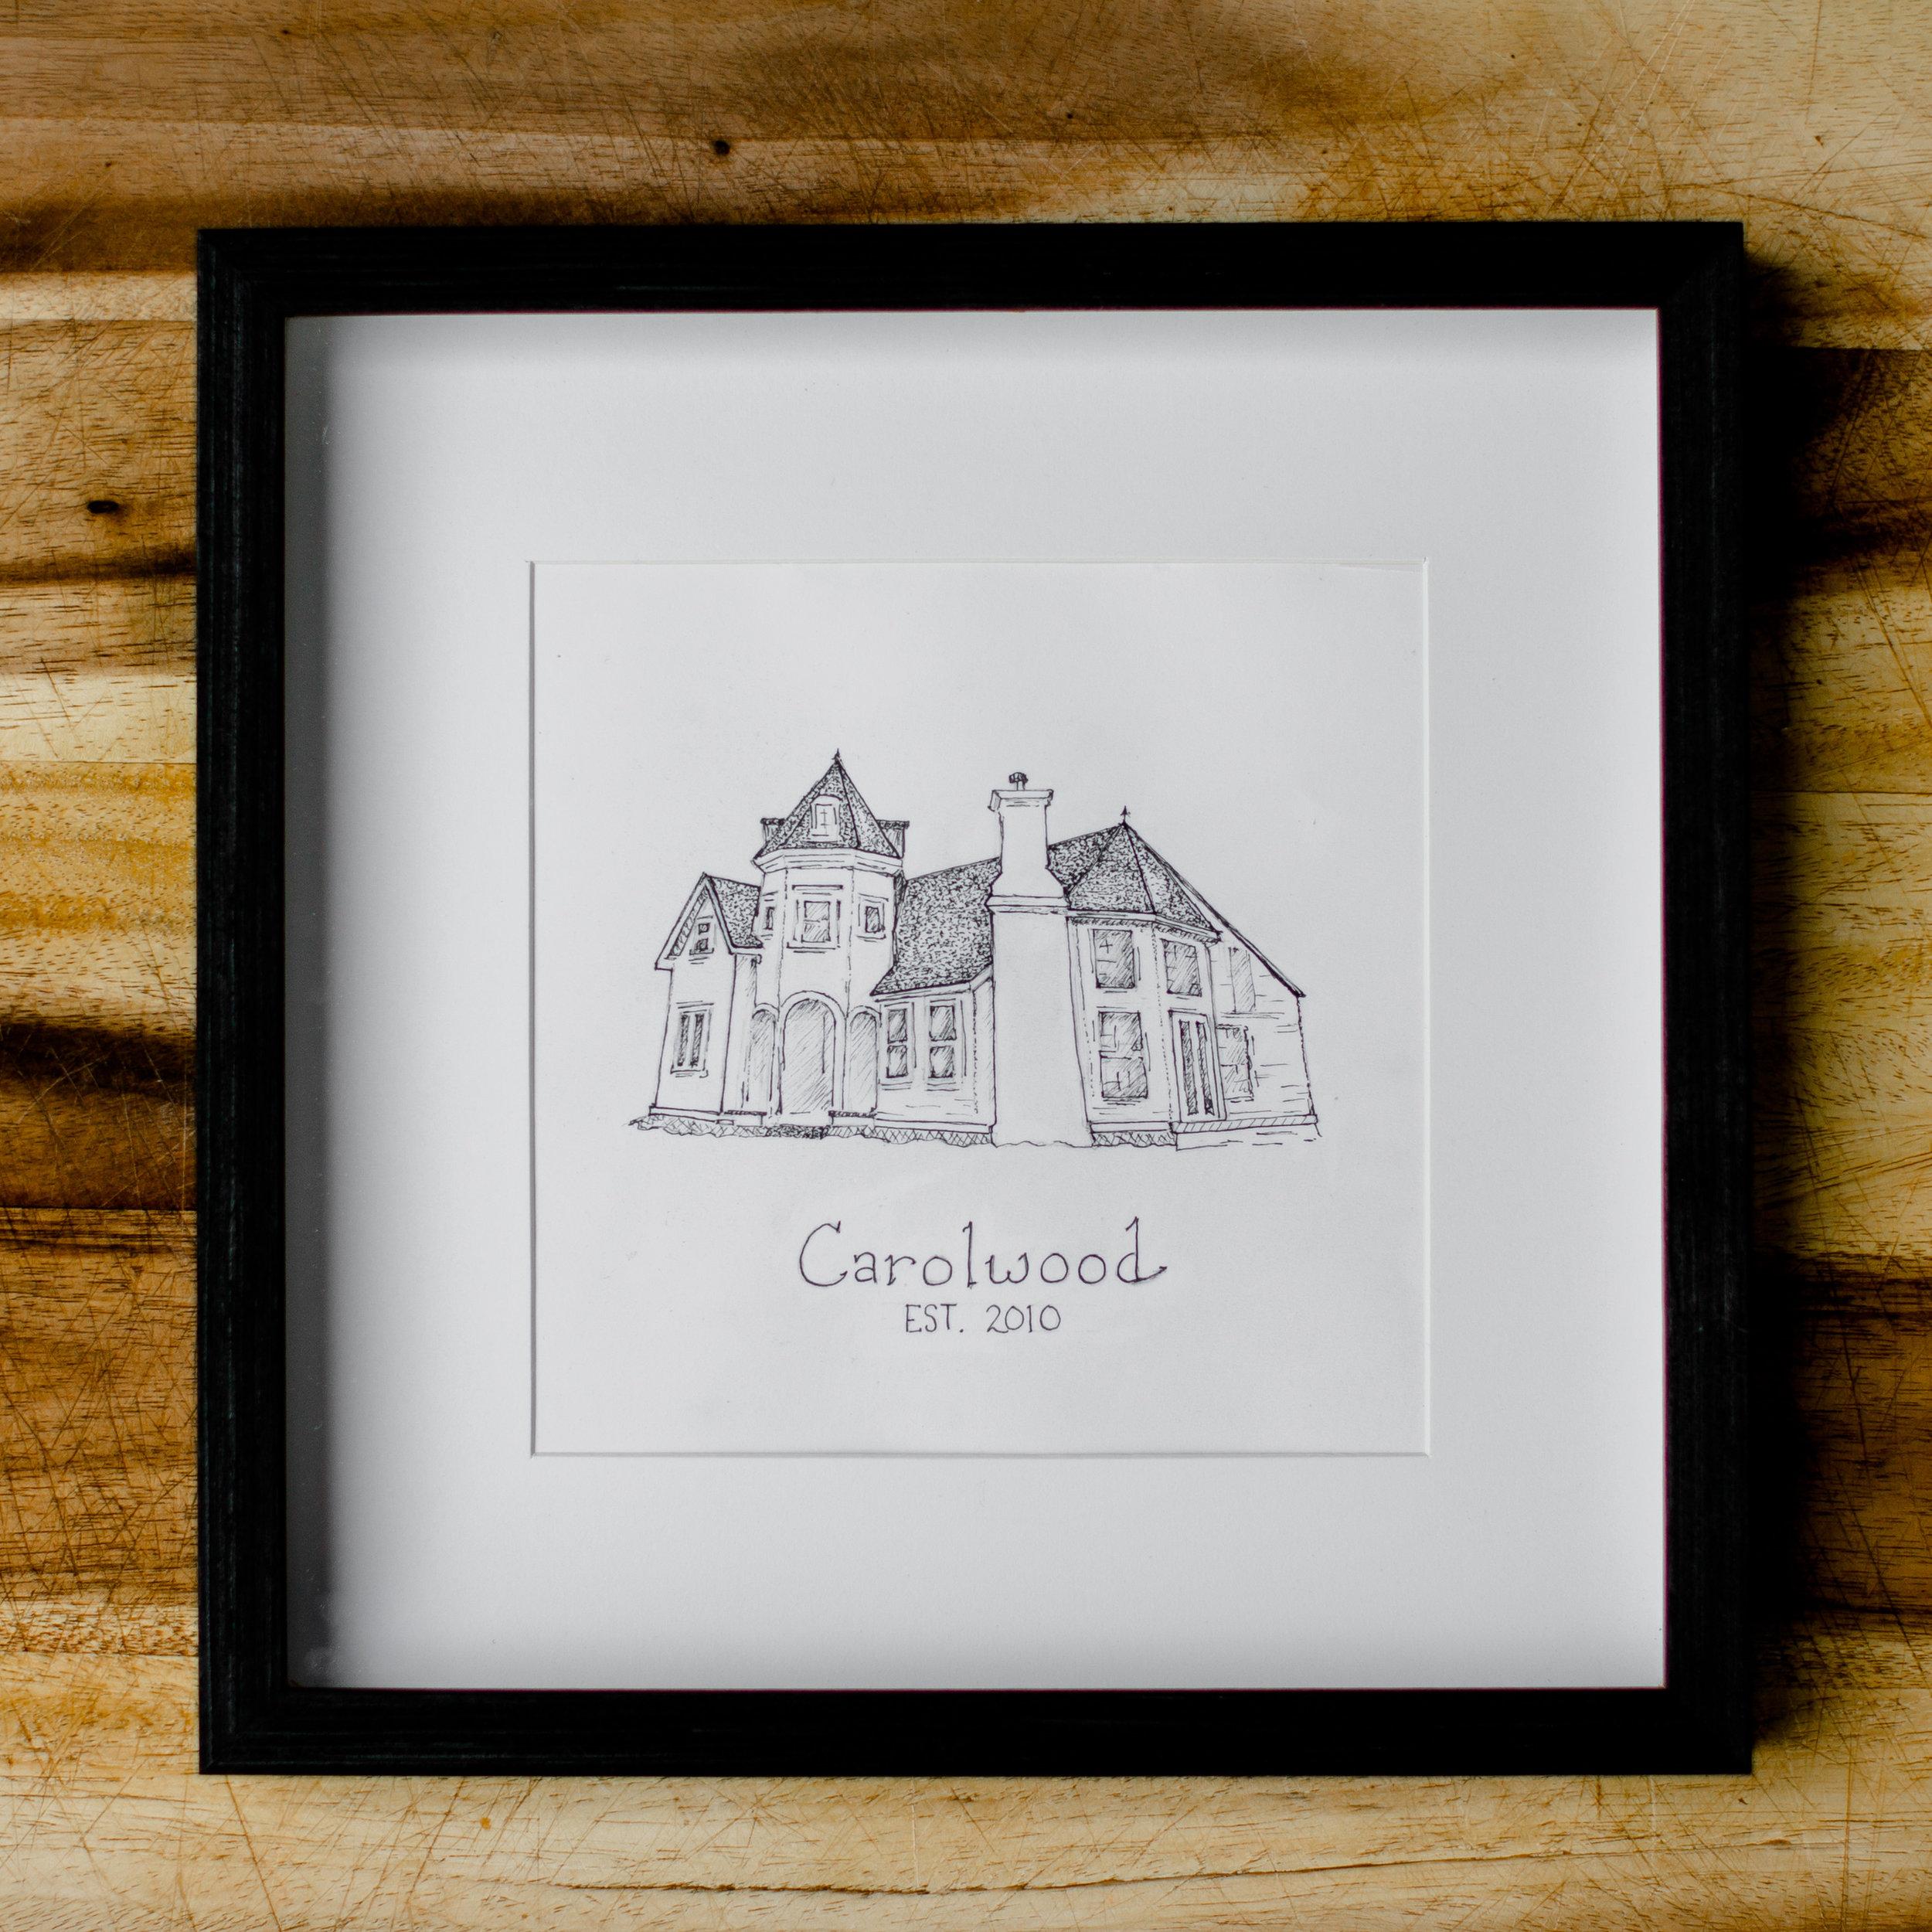 Carolwood